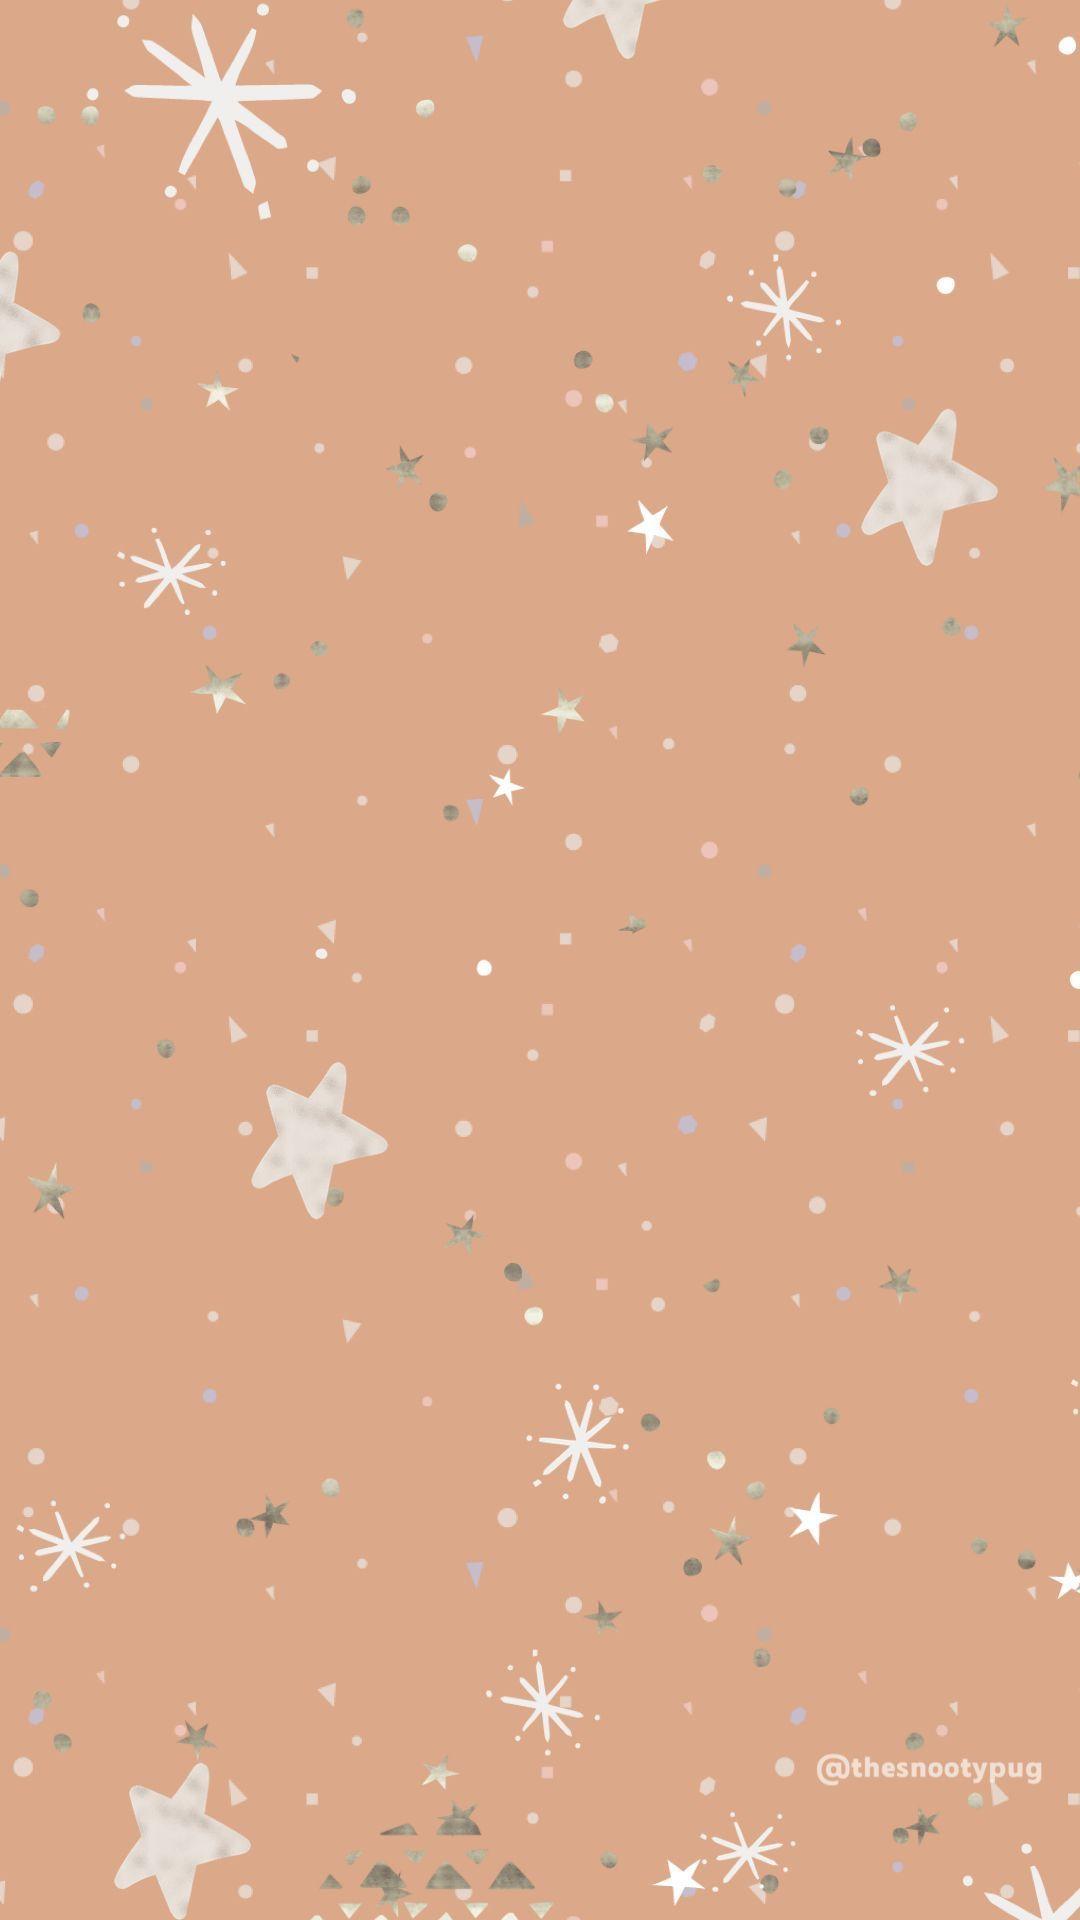 Modern Trendy Christmas Wallpaper Iphone Background Wallpaper Instagram Wallpaper Iphone Background